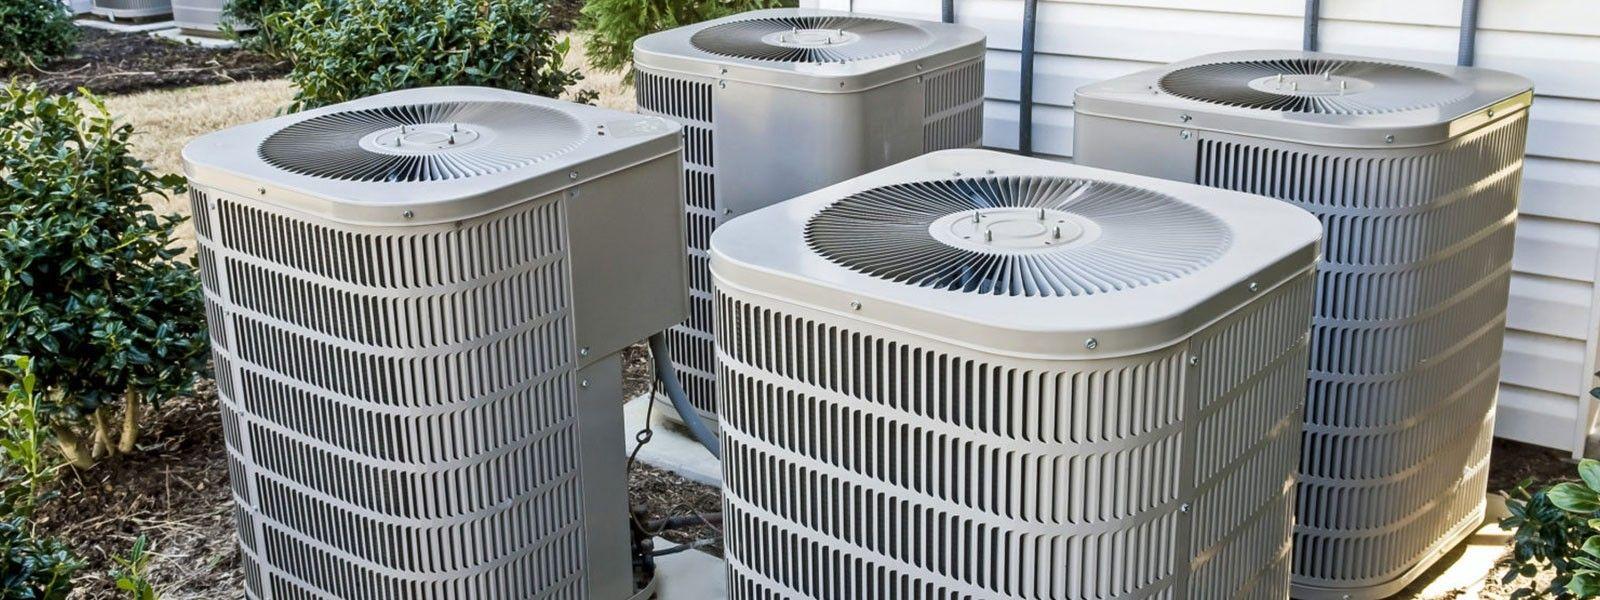 Melo Air In 2020 Heating Repair Air Conditioning Repair Air Conditioner Repair